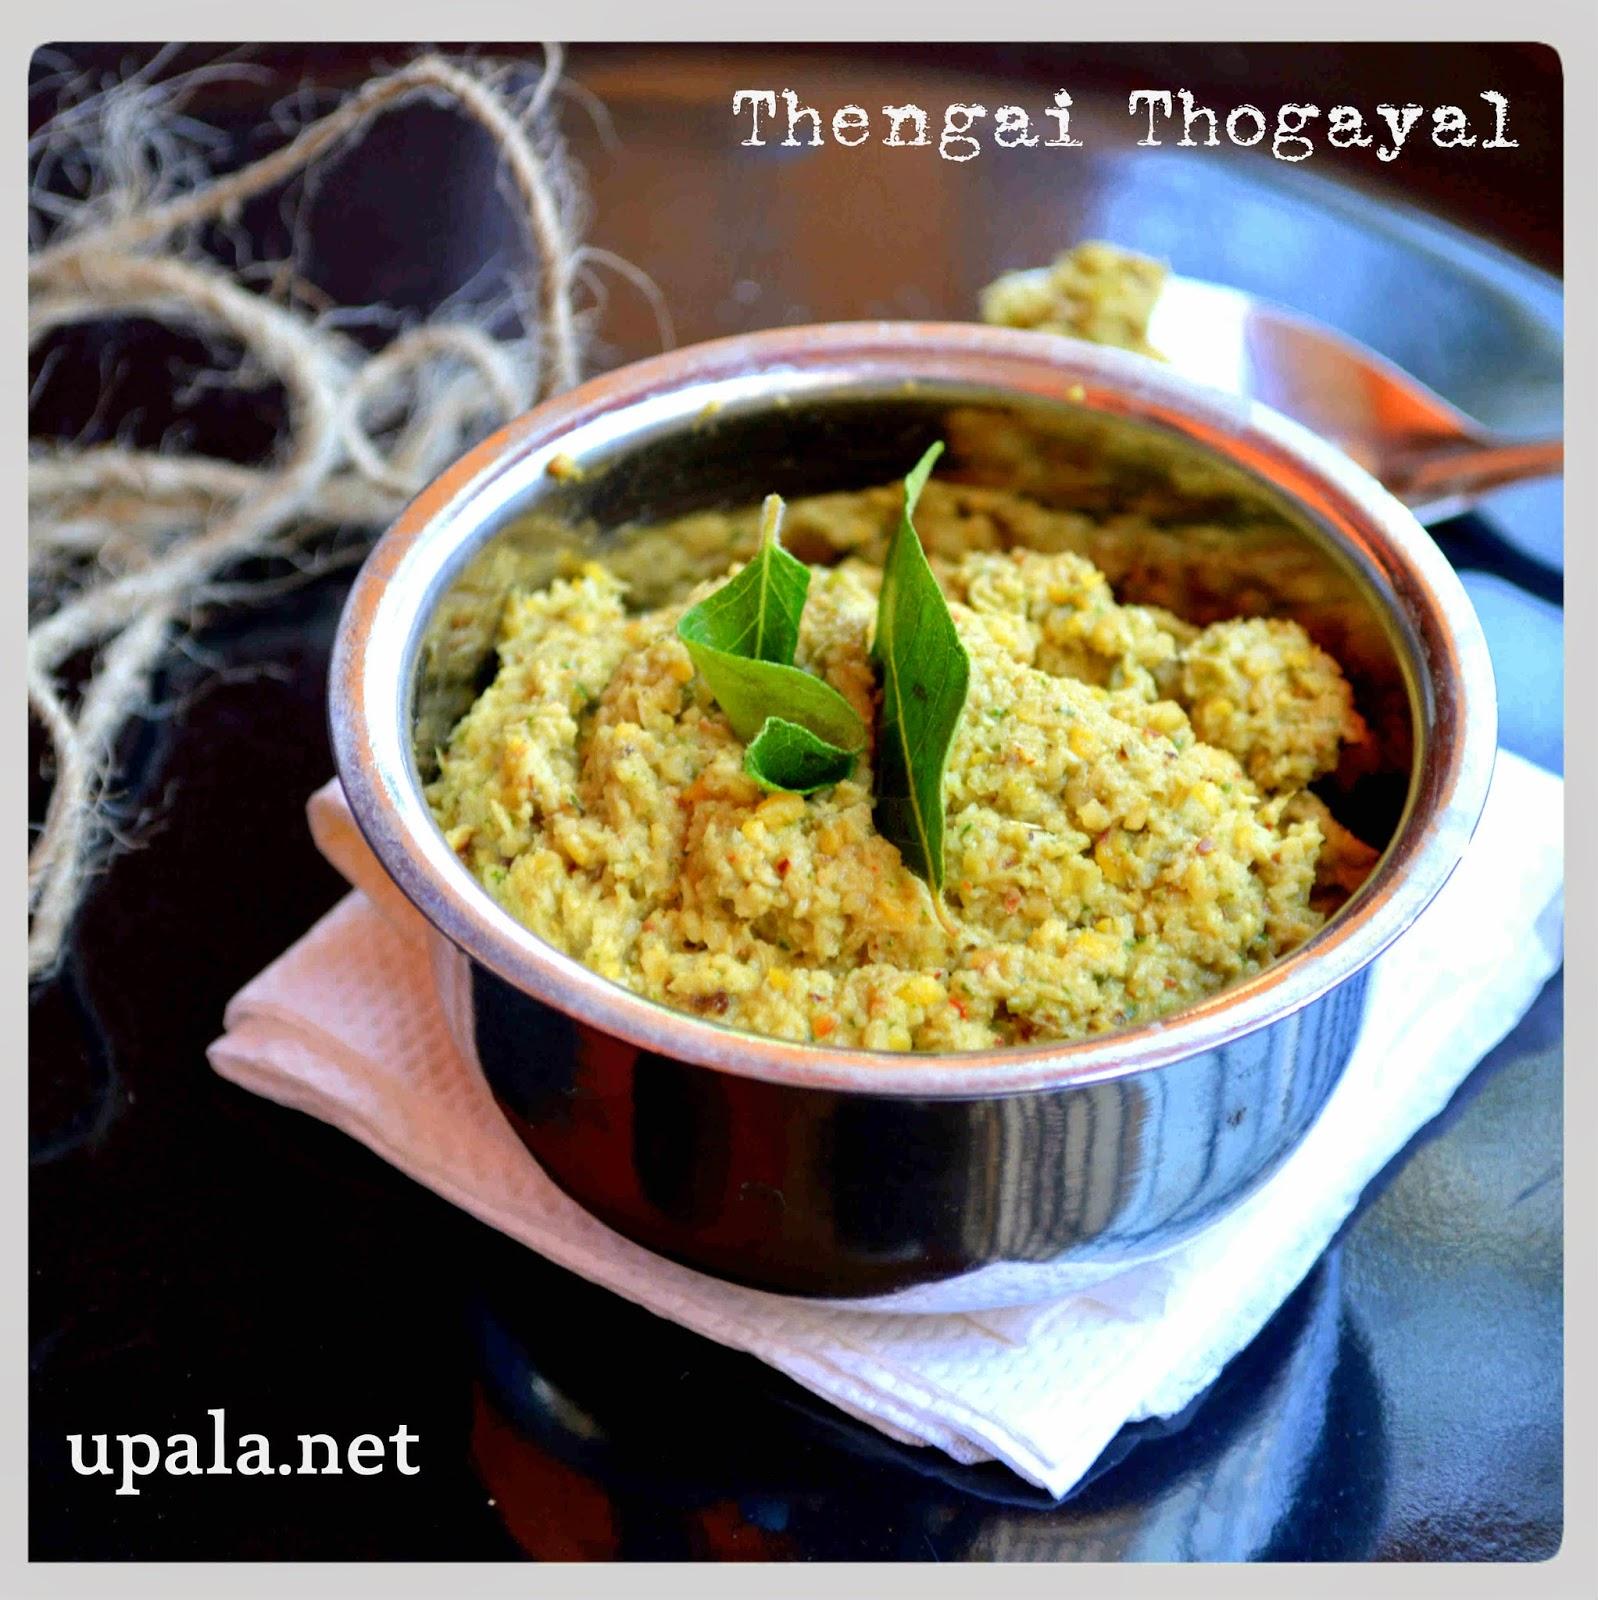 Coconut/thengai thogayal